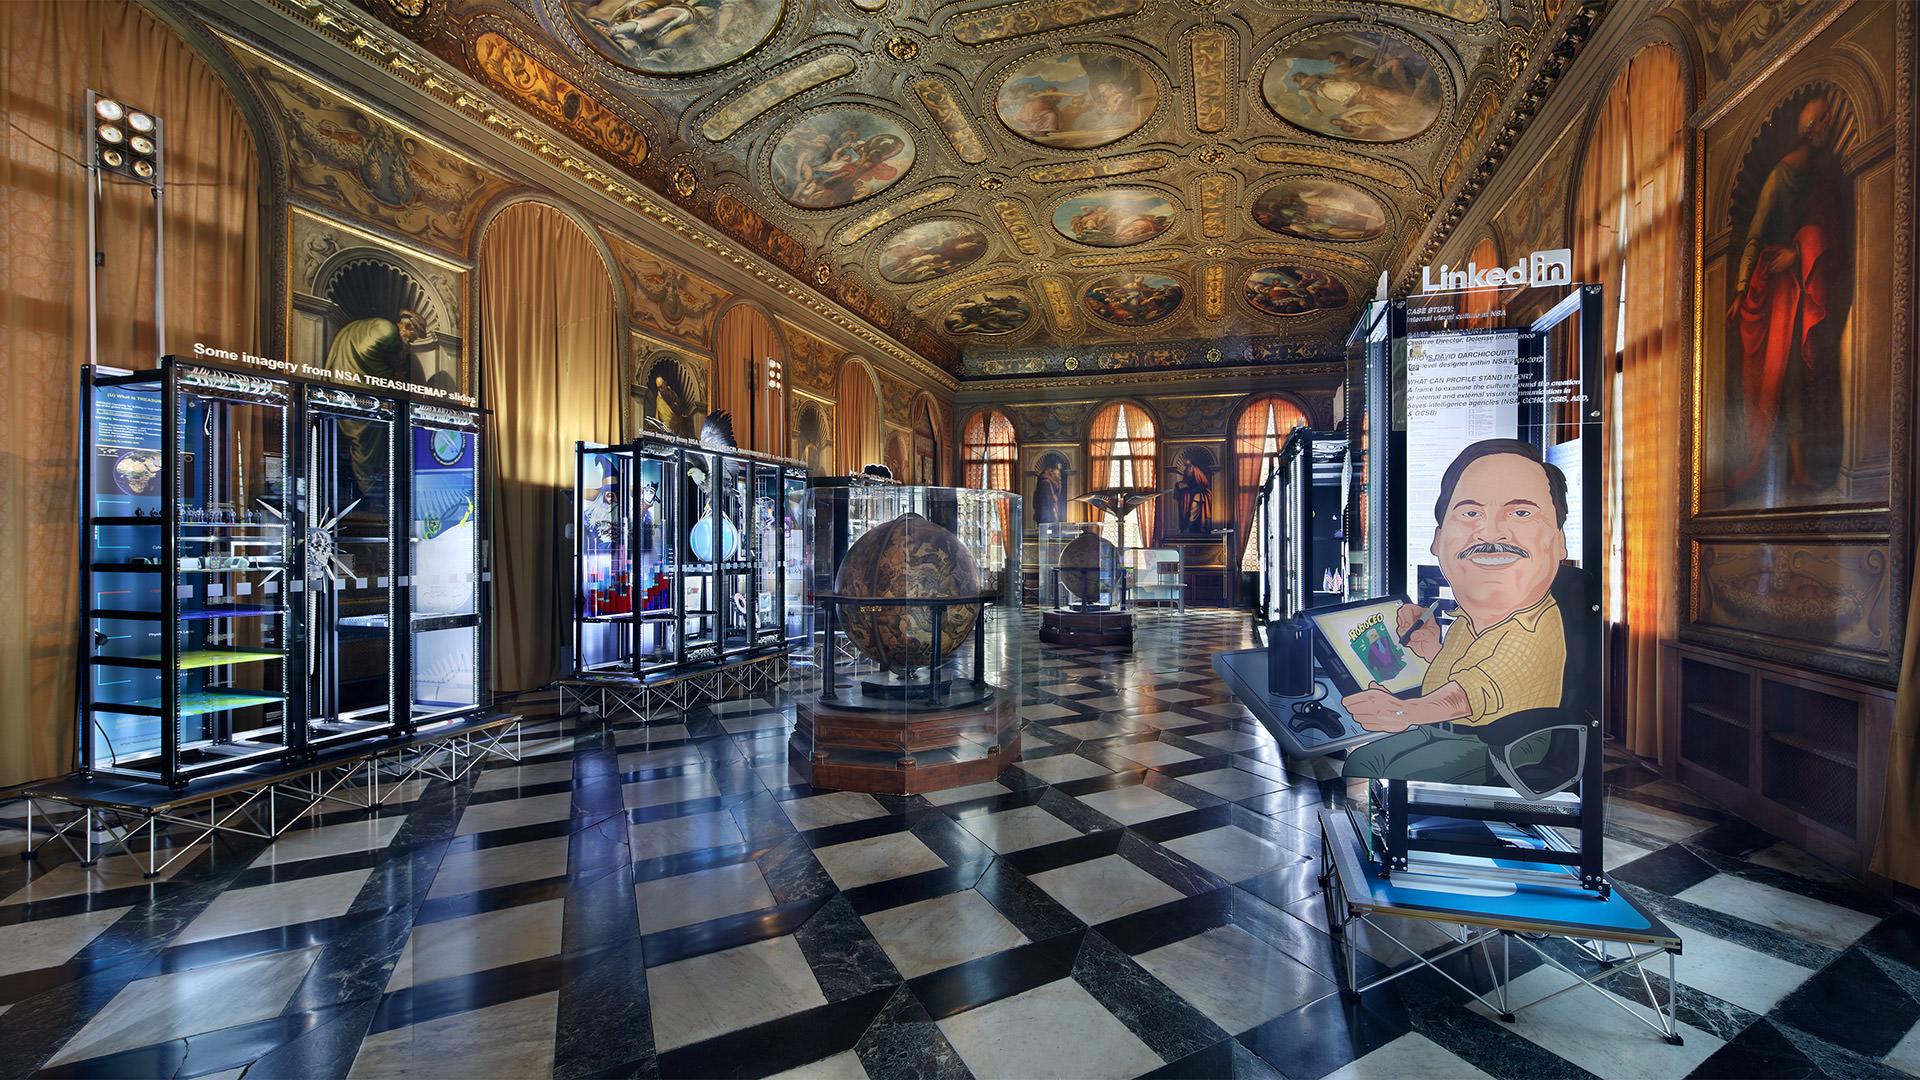 Installation view of Simon Denny, Secret Power, 56th Venice Biennale, 2015